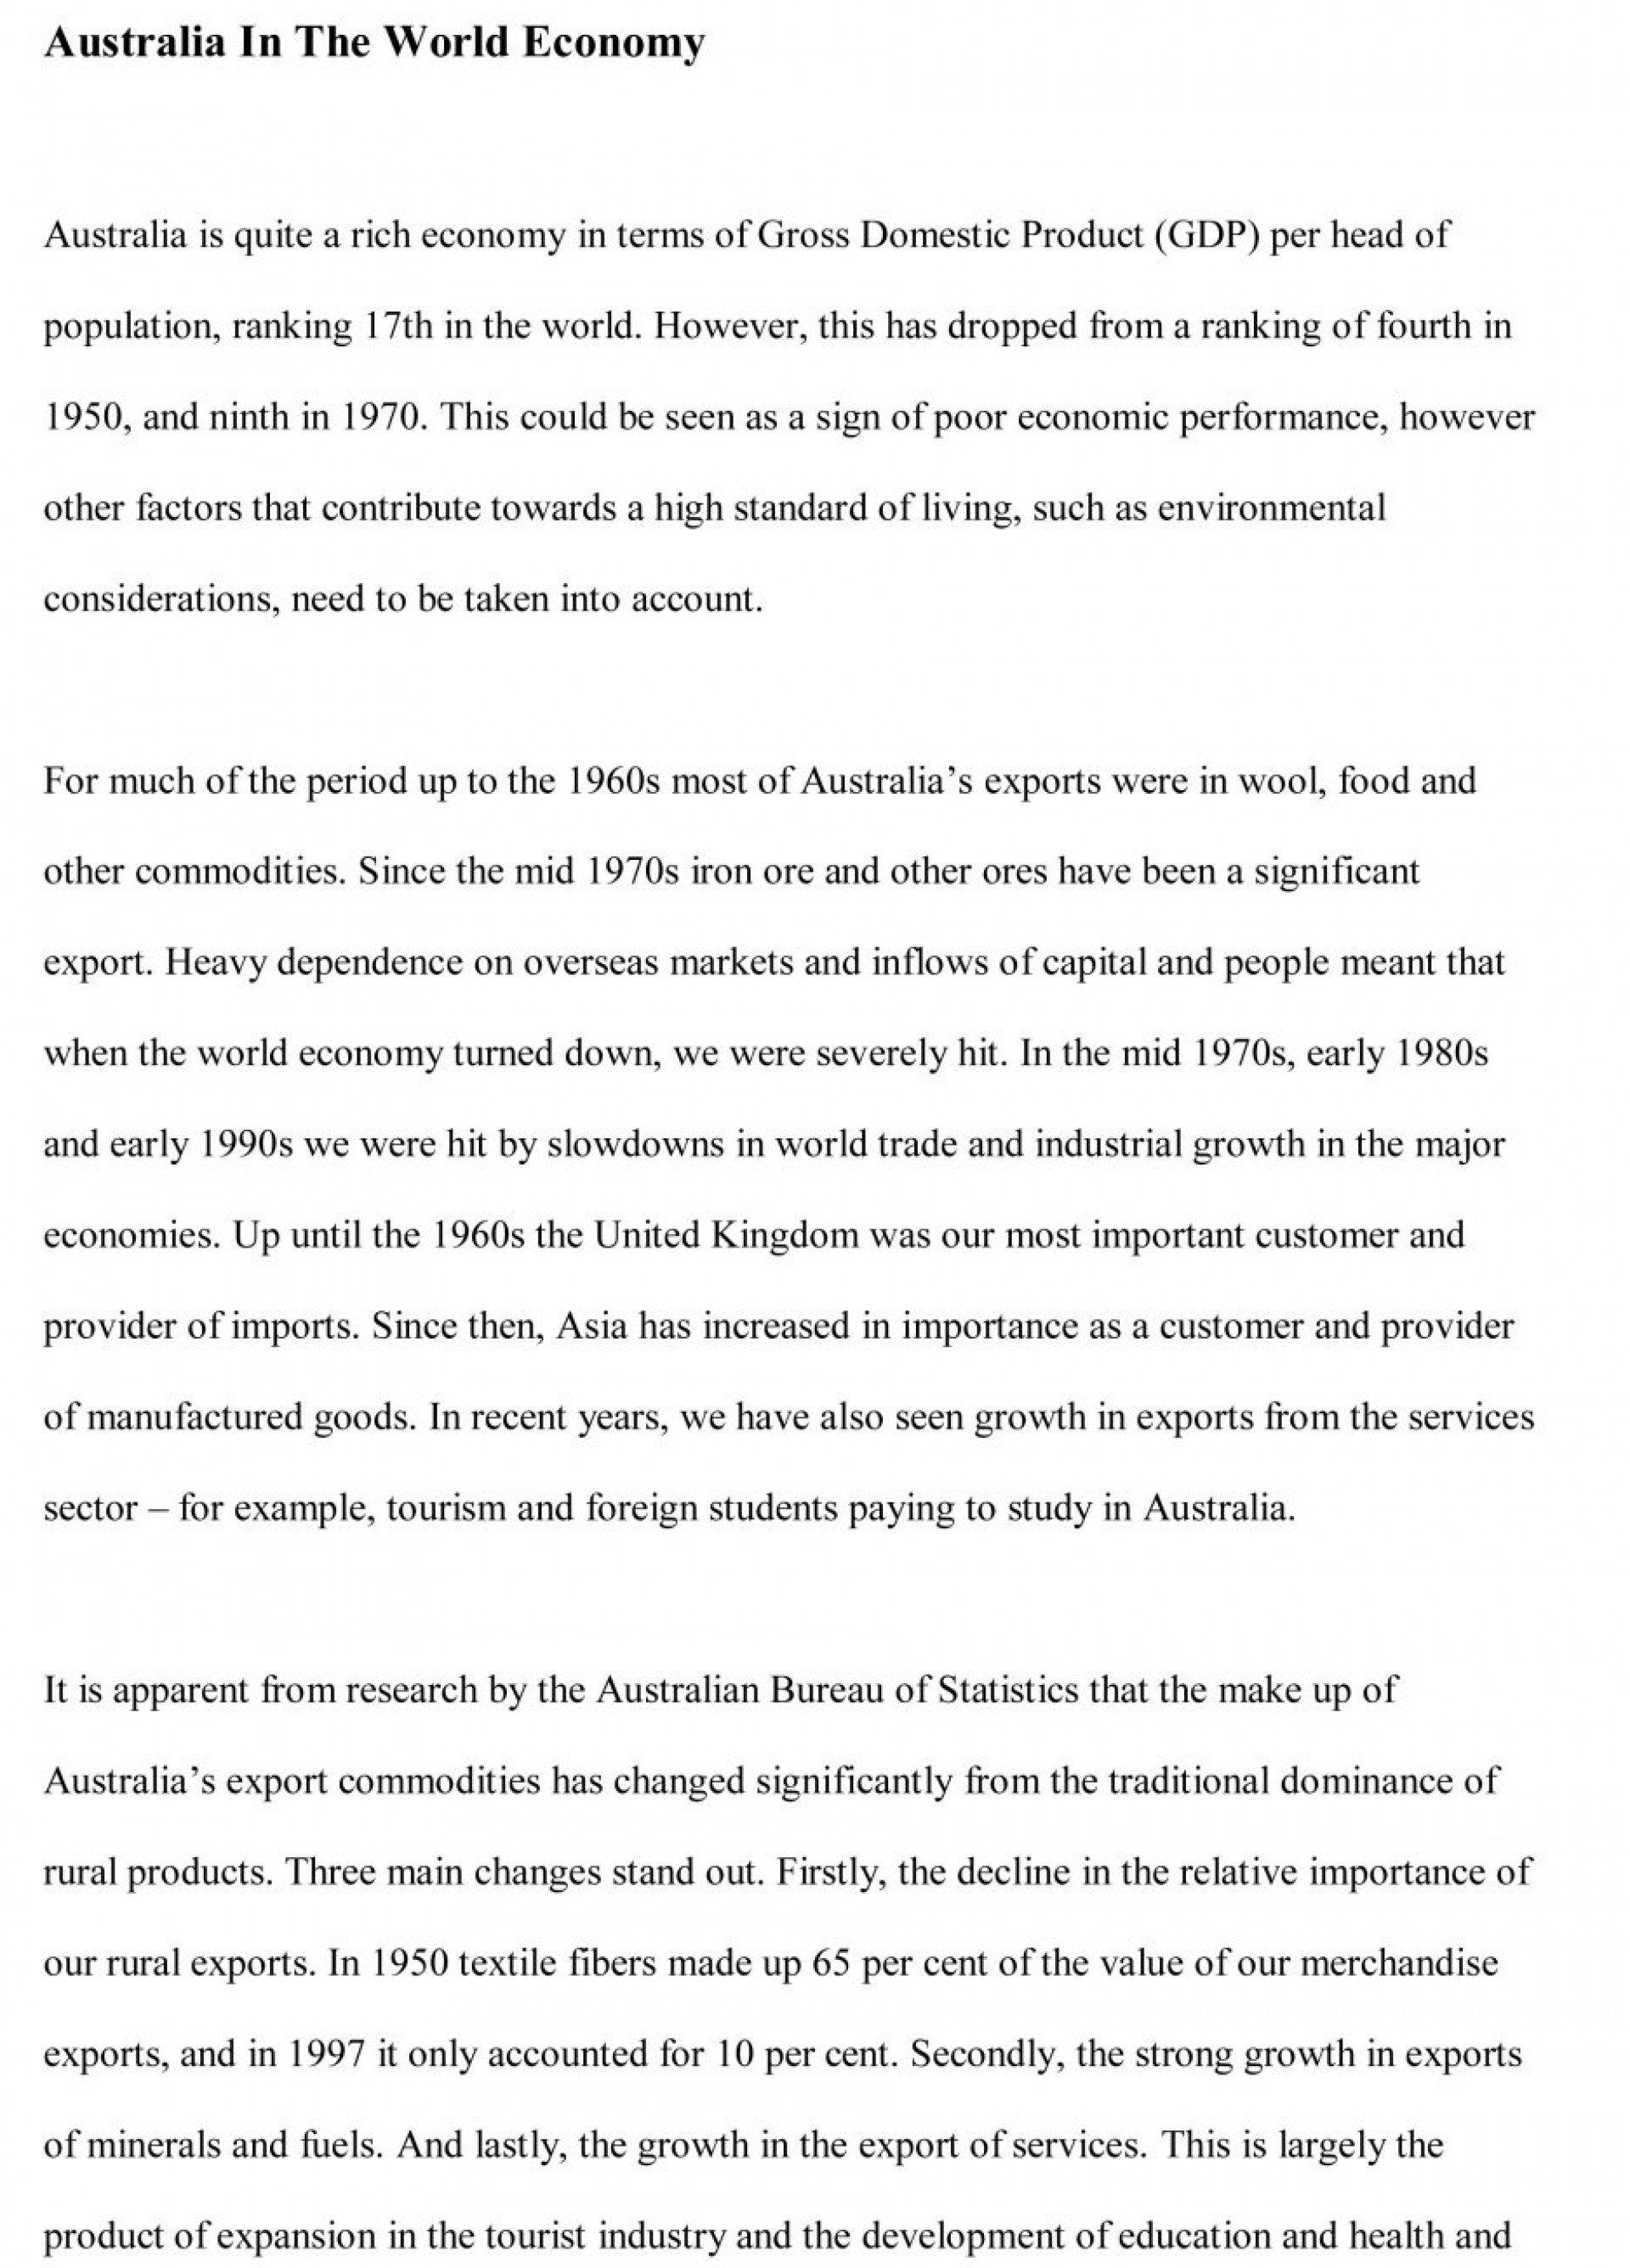 007 Essay Example Anecdote Sample Examples Economics Anecdotes For Essays Sensational 1920